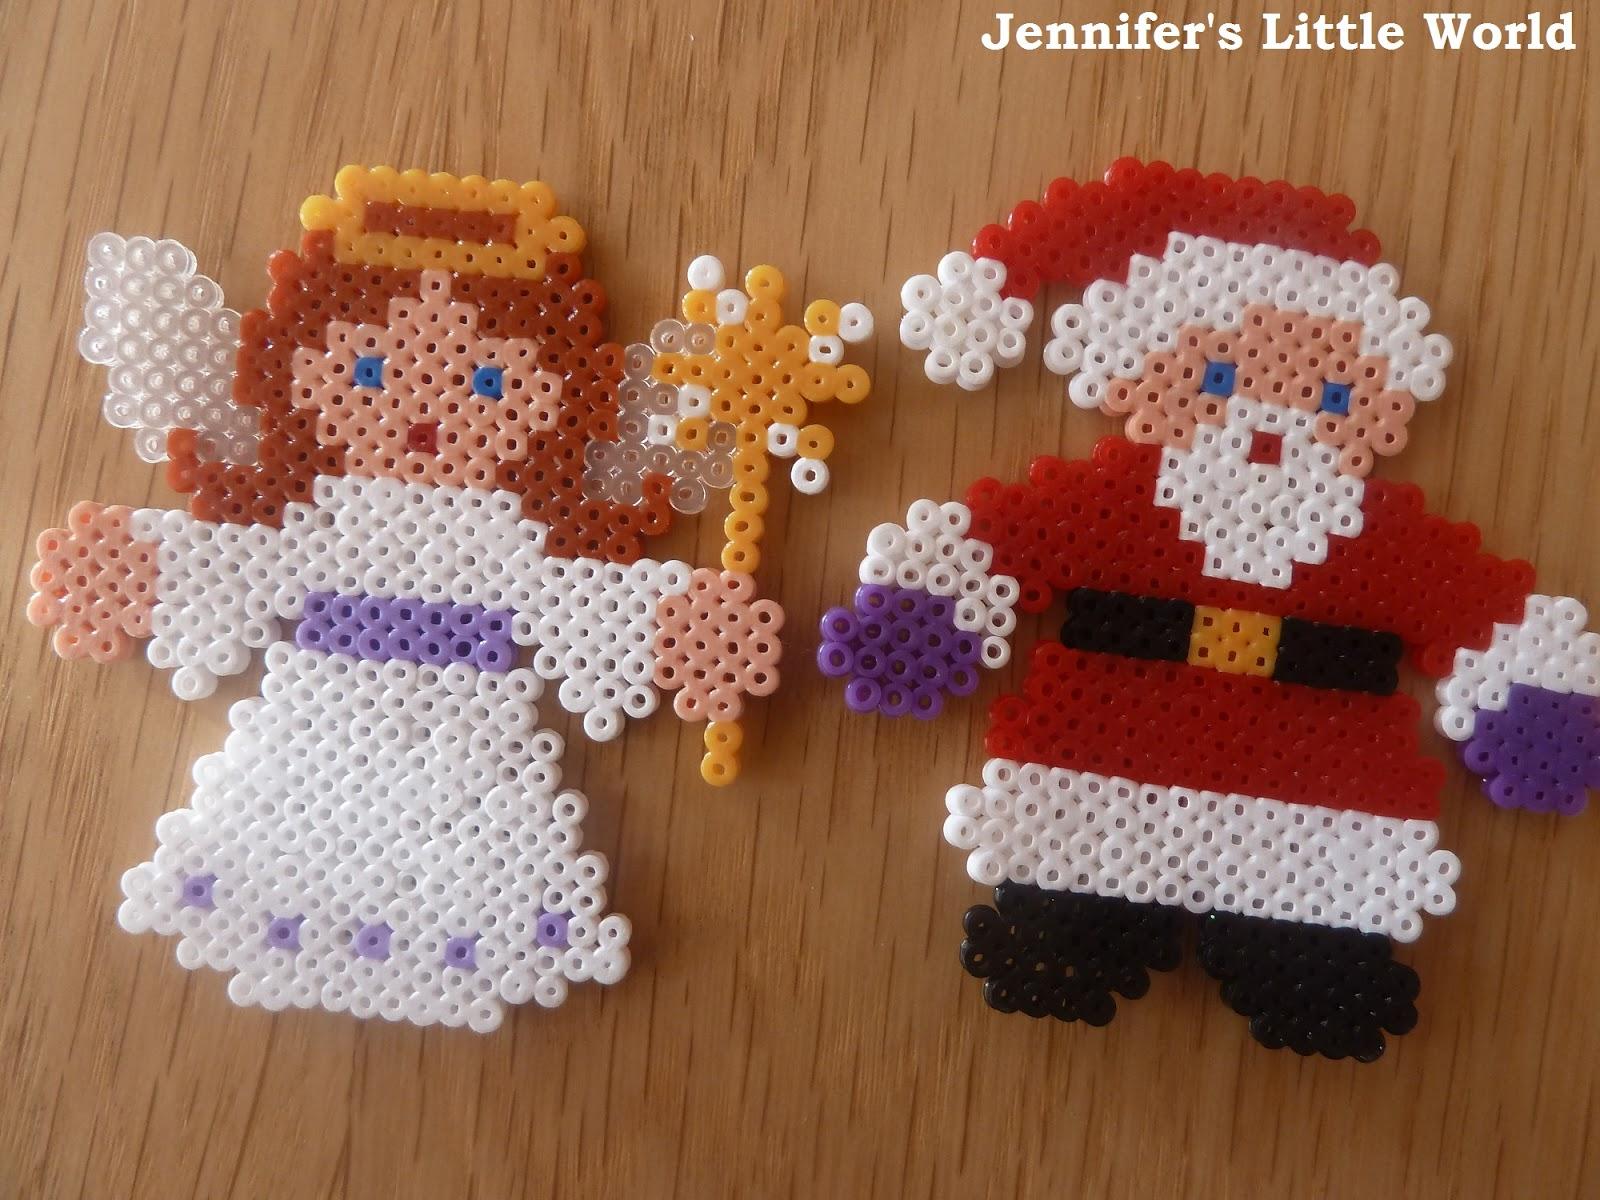 Christmas Hama Beads.Jennifer S Little World Blog Parenting Craft And Travel